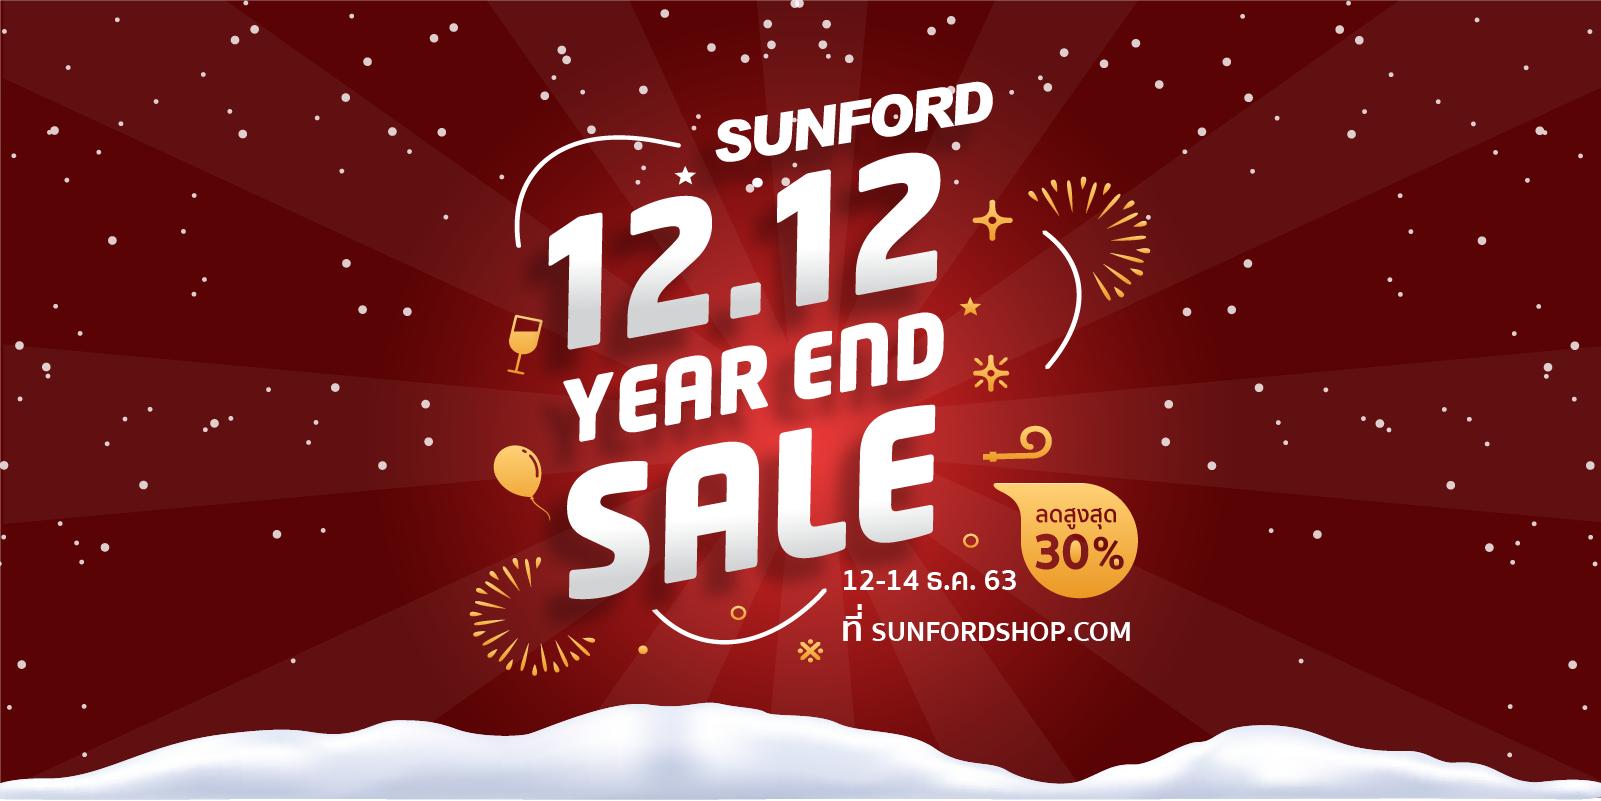 SUNFORD 12.12 YEAR END SALE